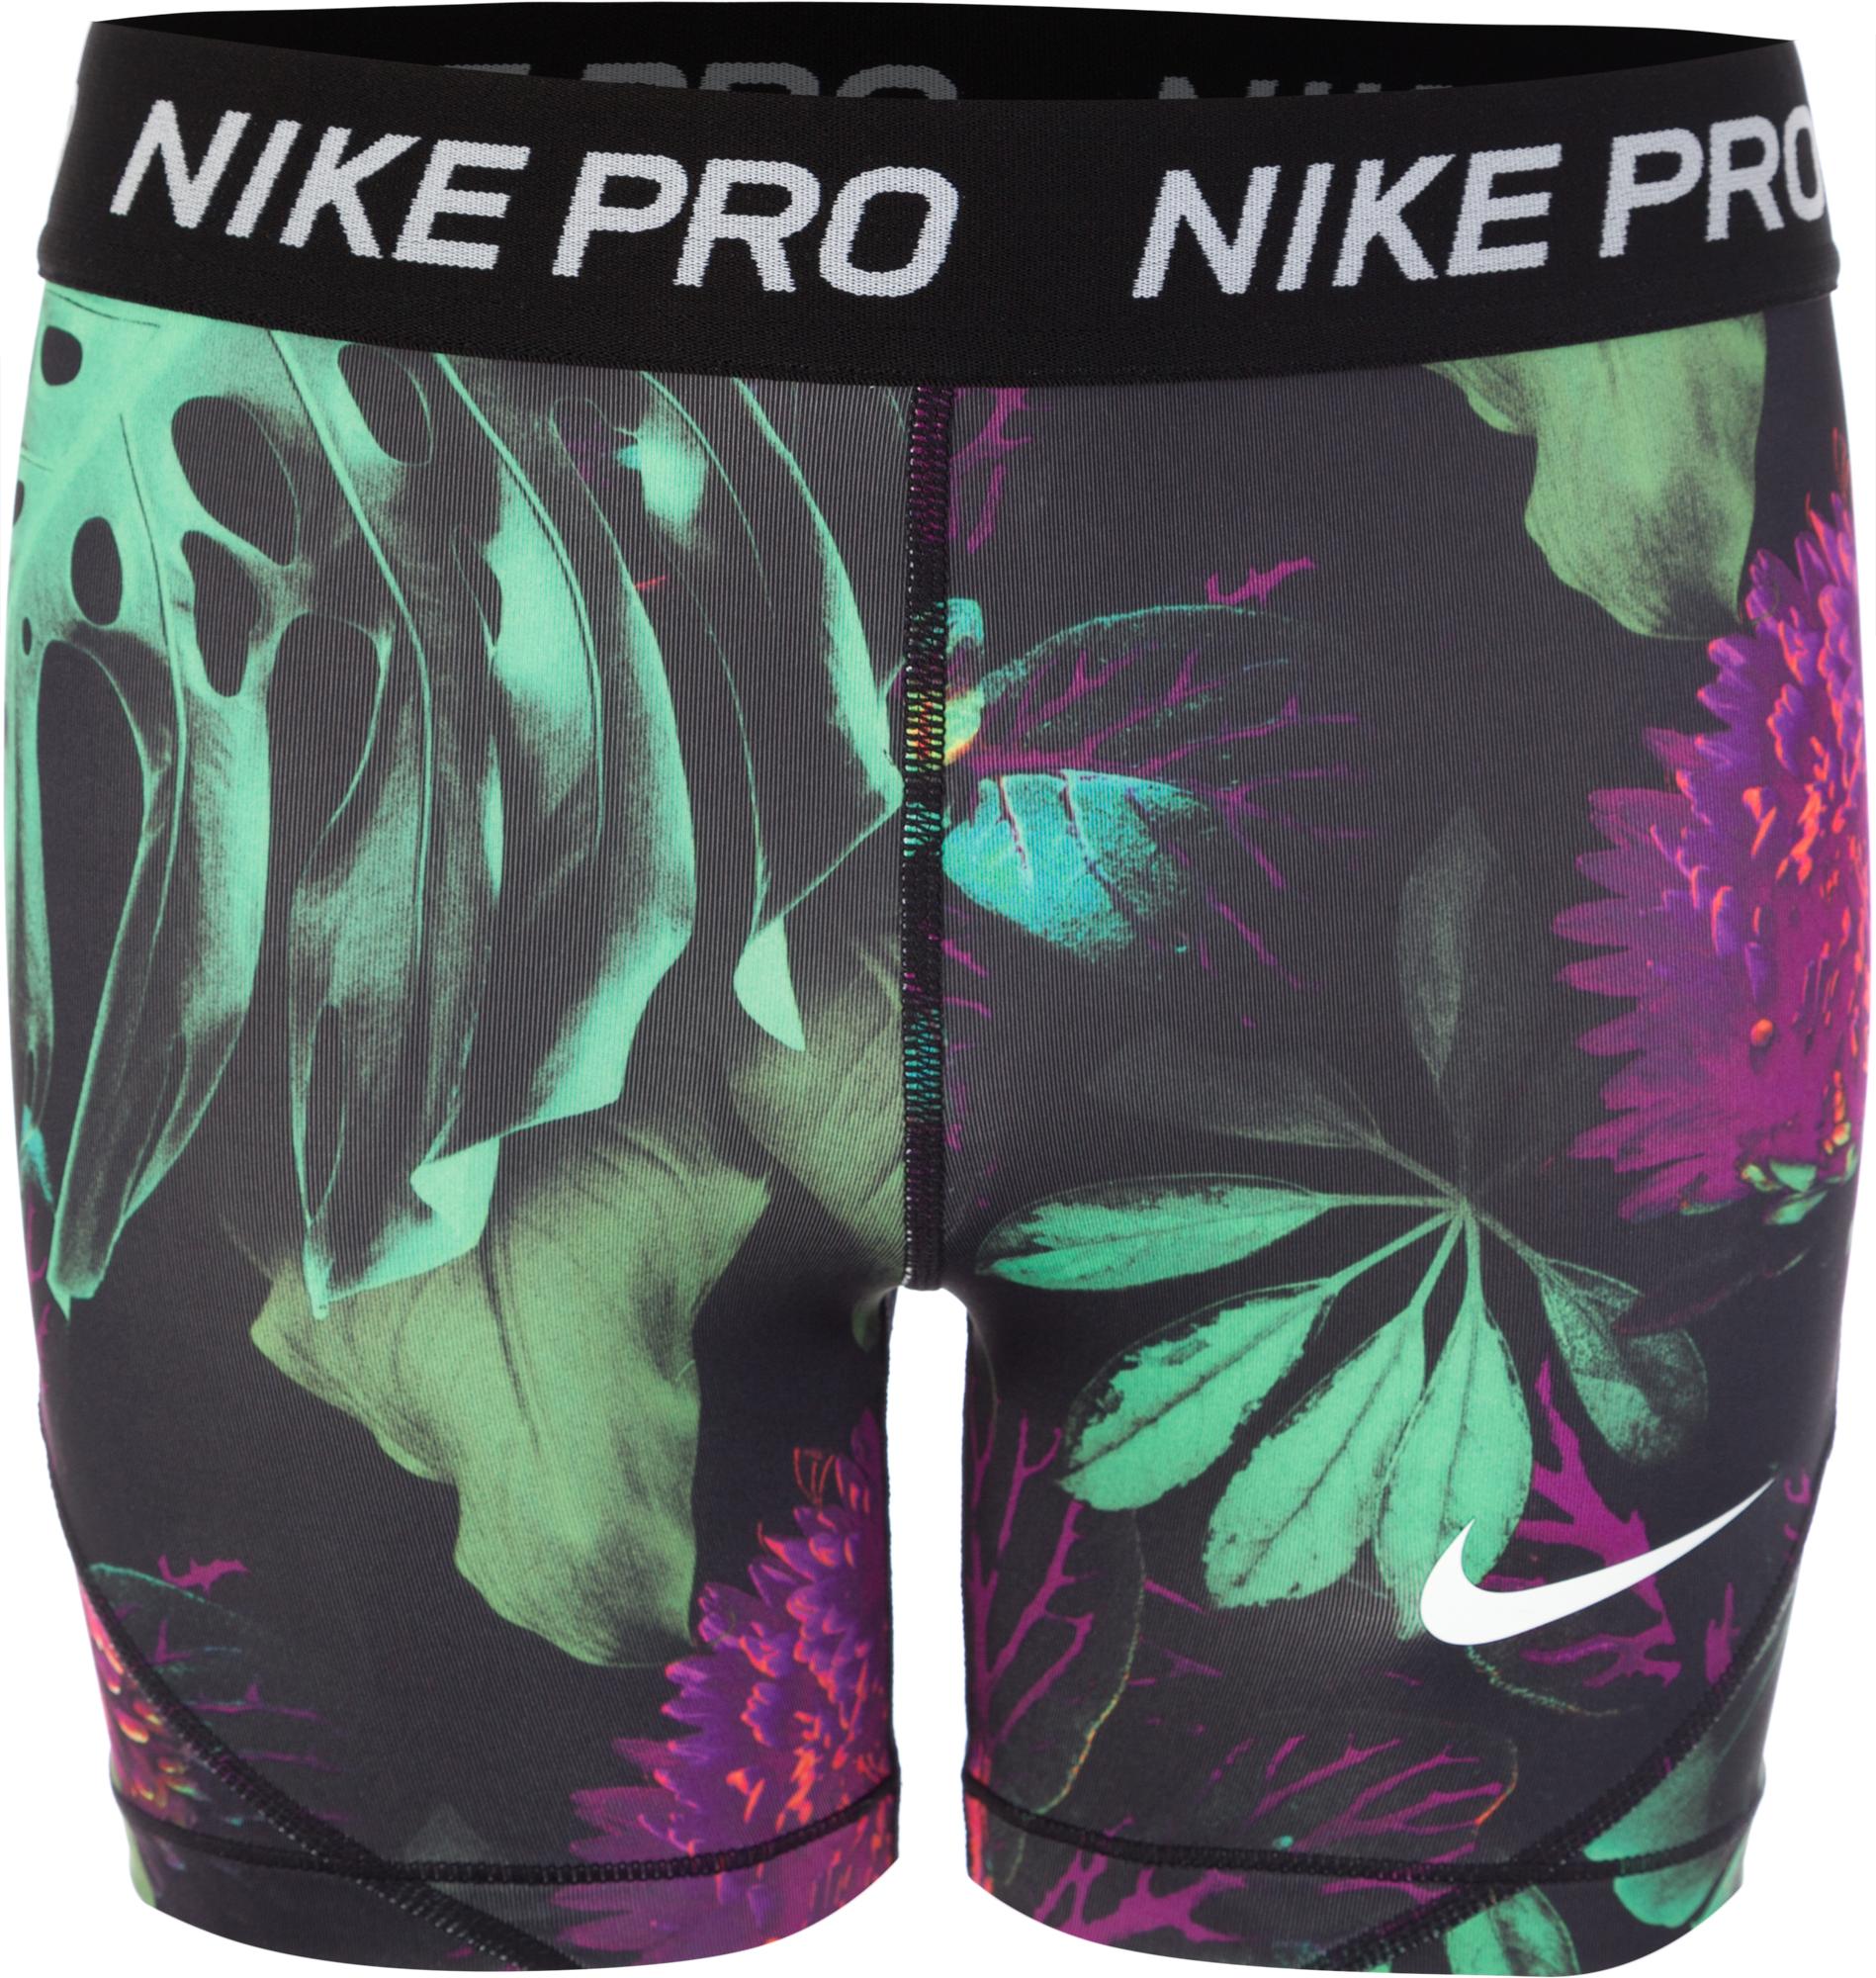 Nike Шорты для девочек Nike Pro, размер 156-164